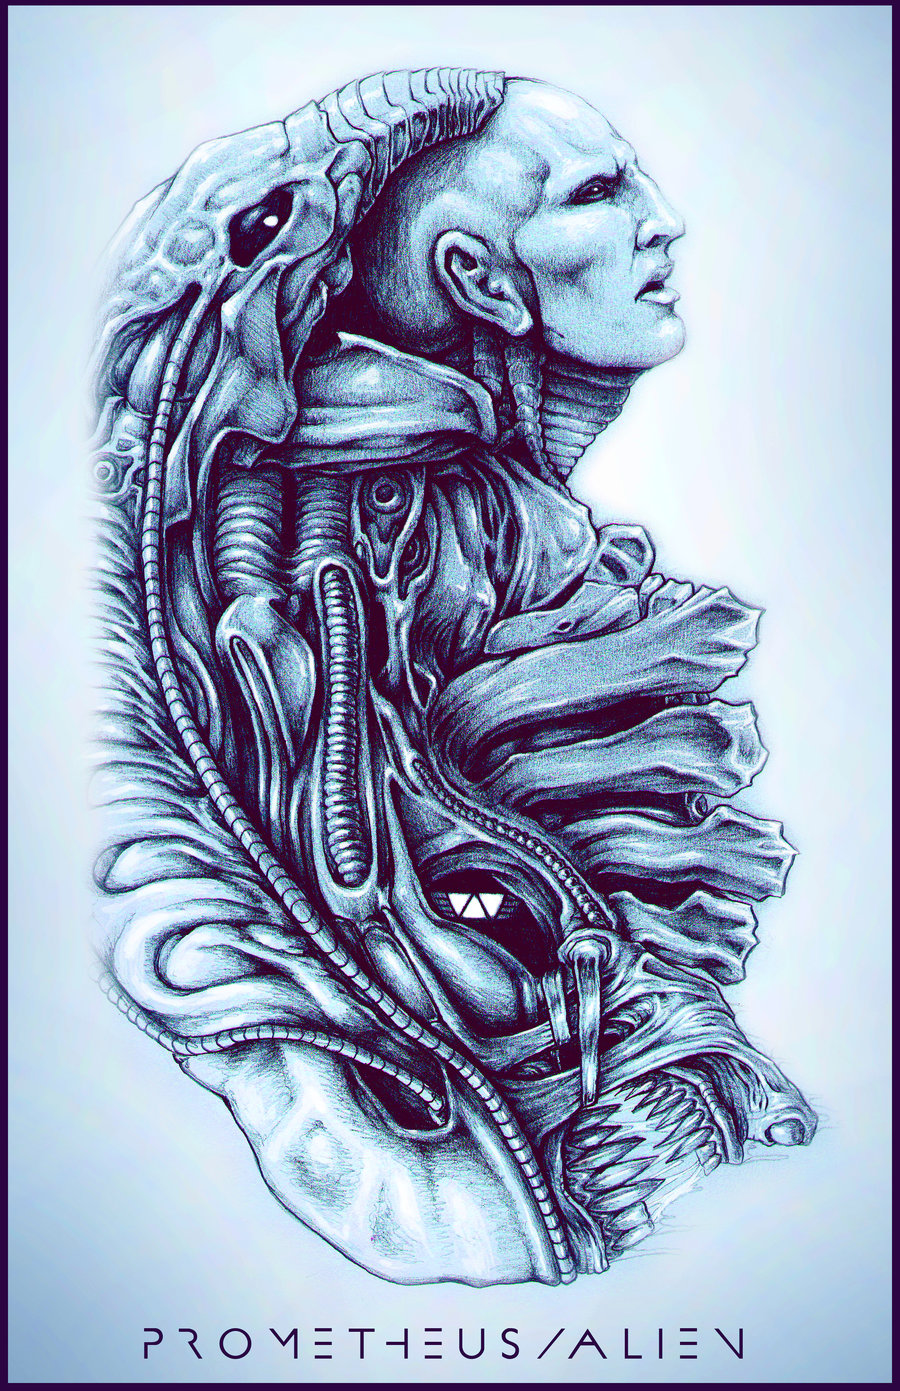 Drawn predator engineer ZachSmithson  WIP Prometheus/Alien by